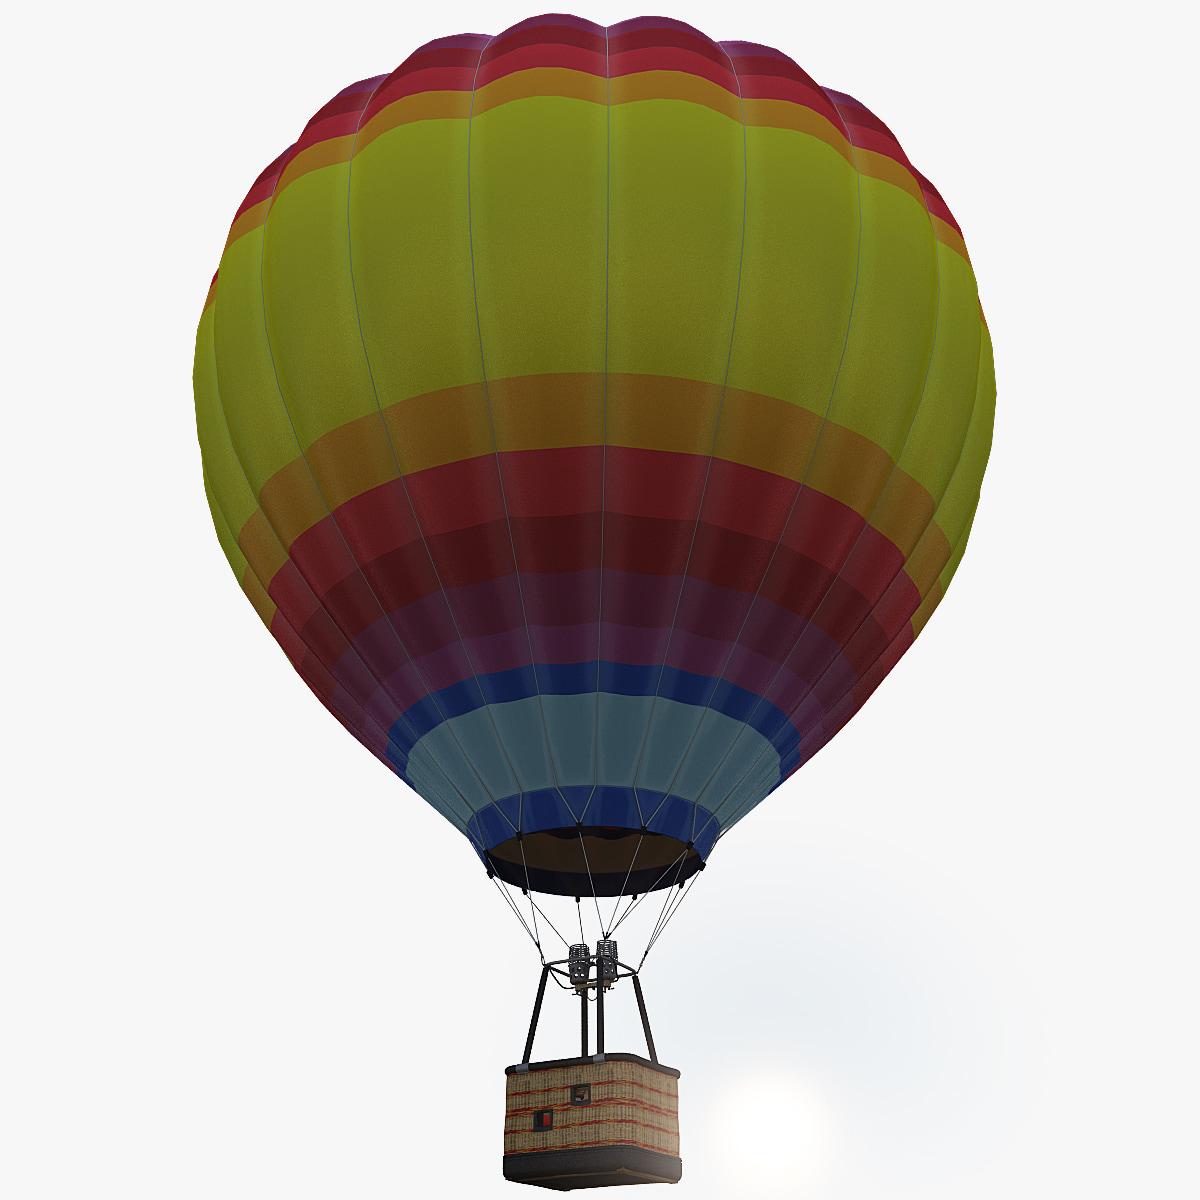 Air_Balloon_V2_Vray_0000_1.jpg